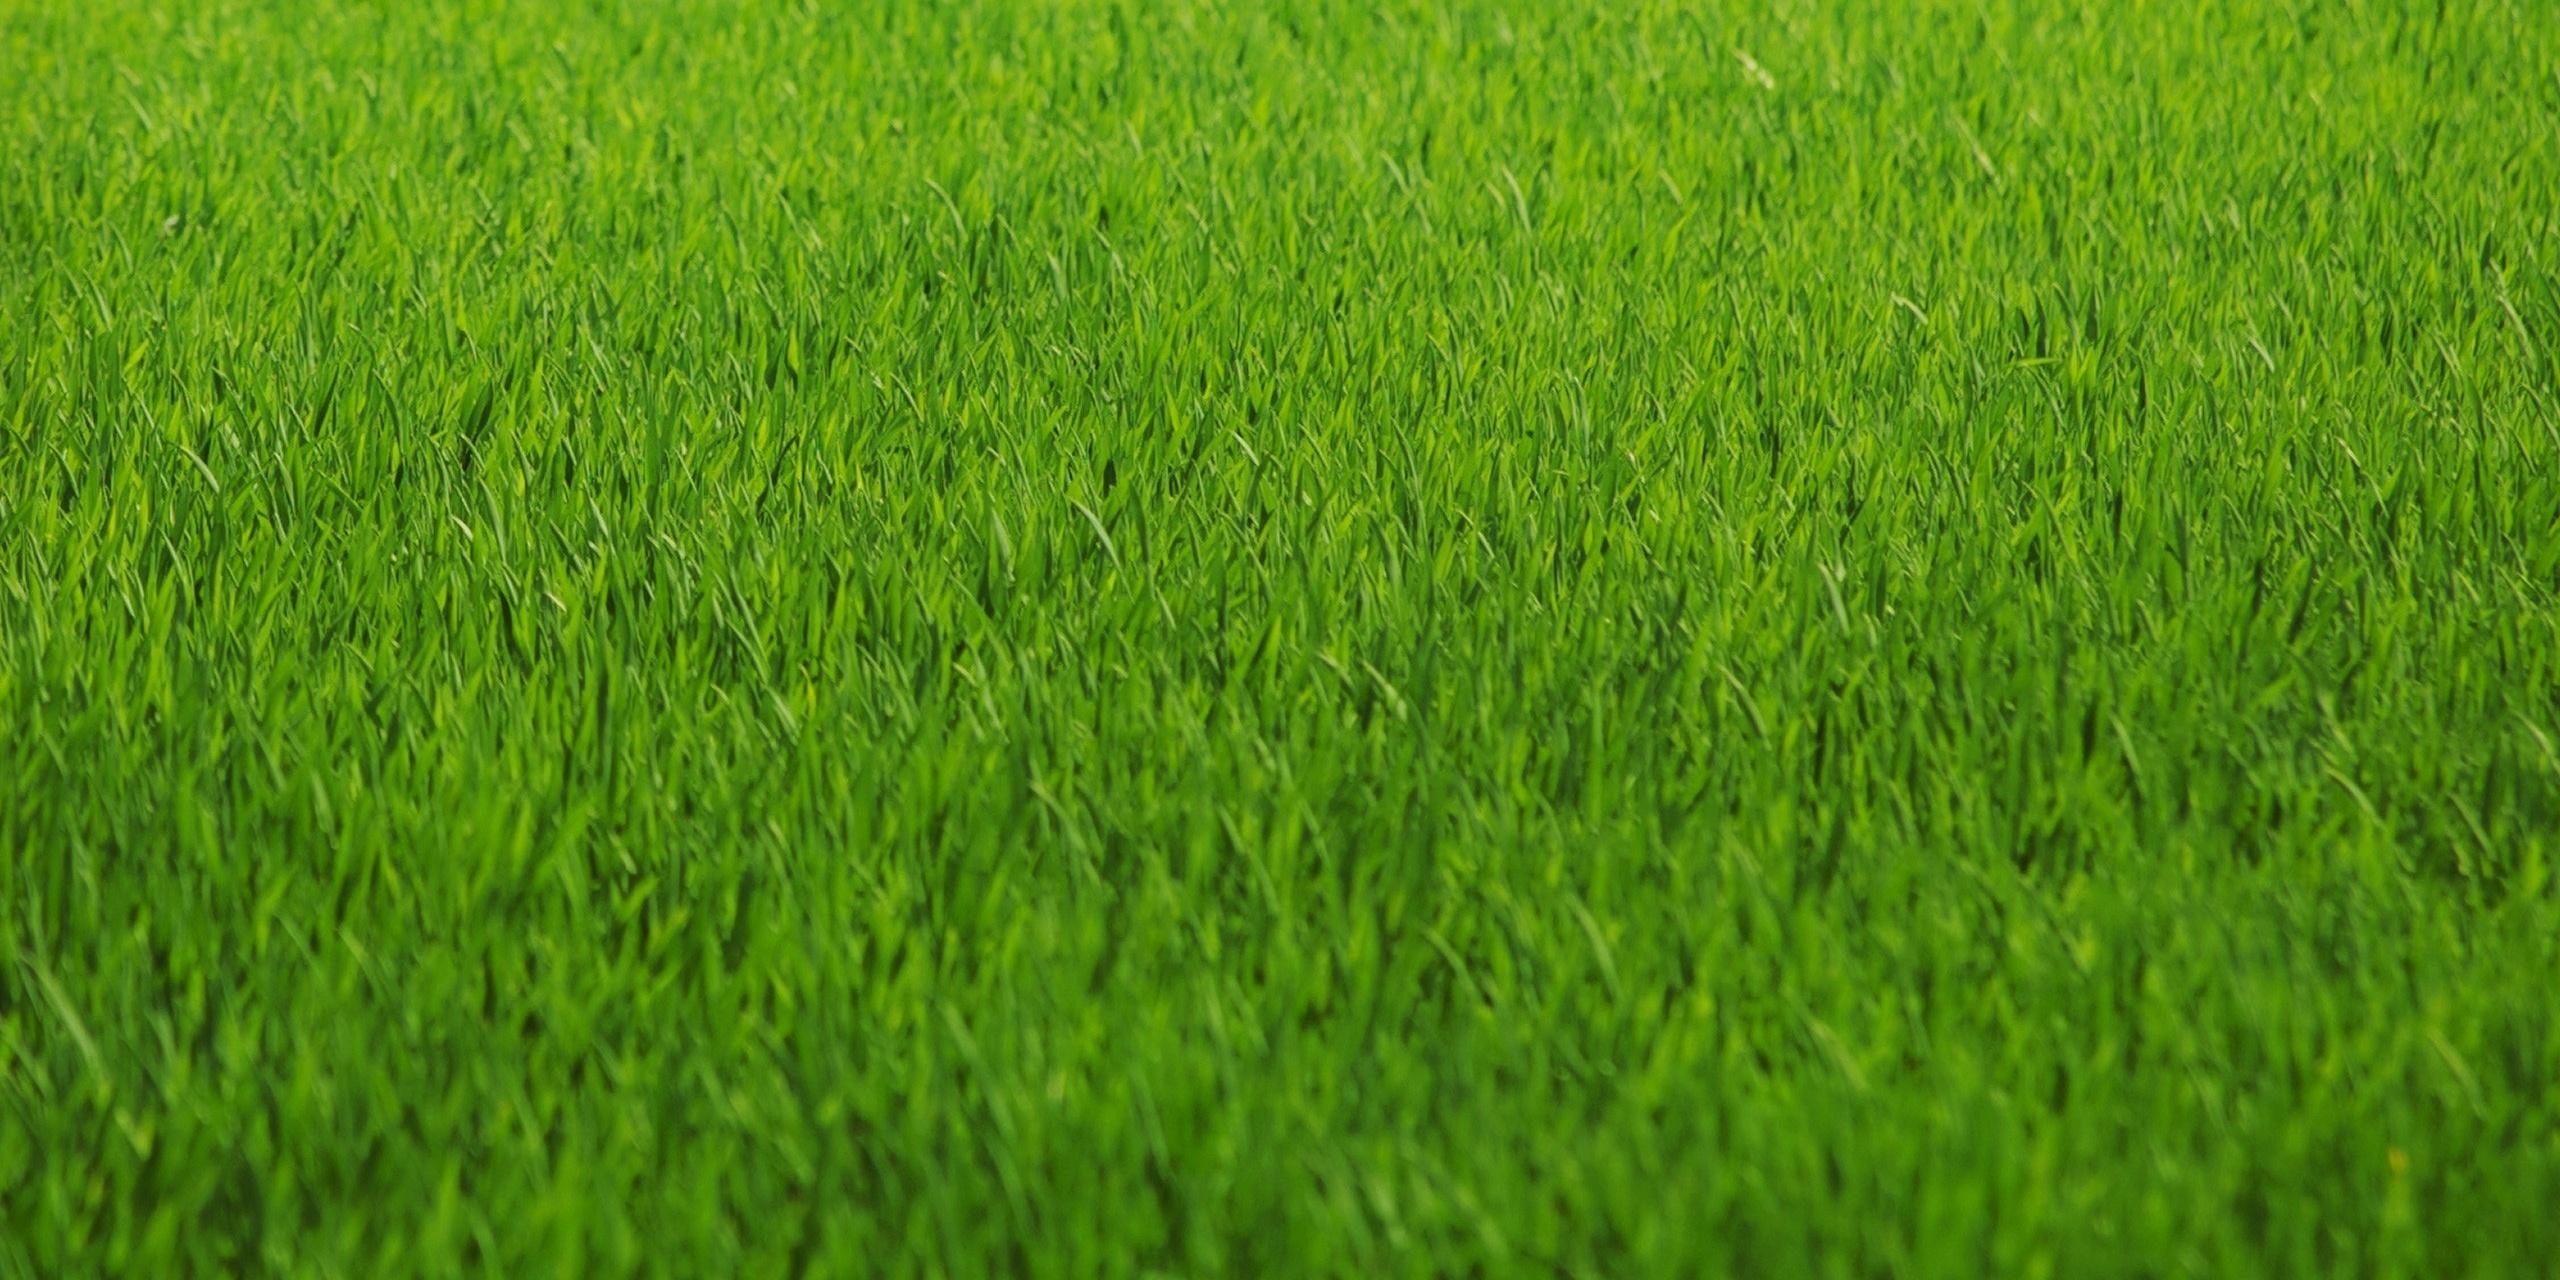 landscape-staging-lawn.jpg